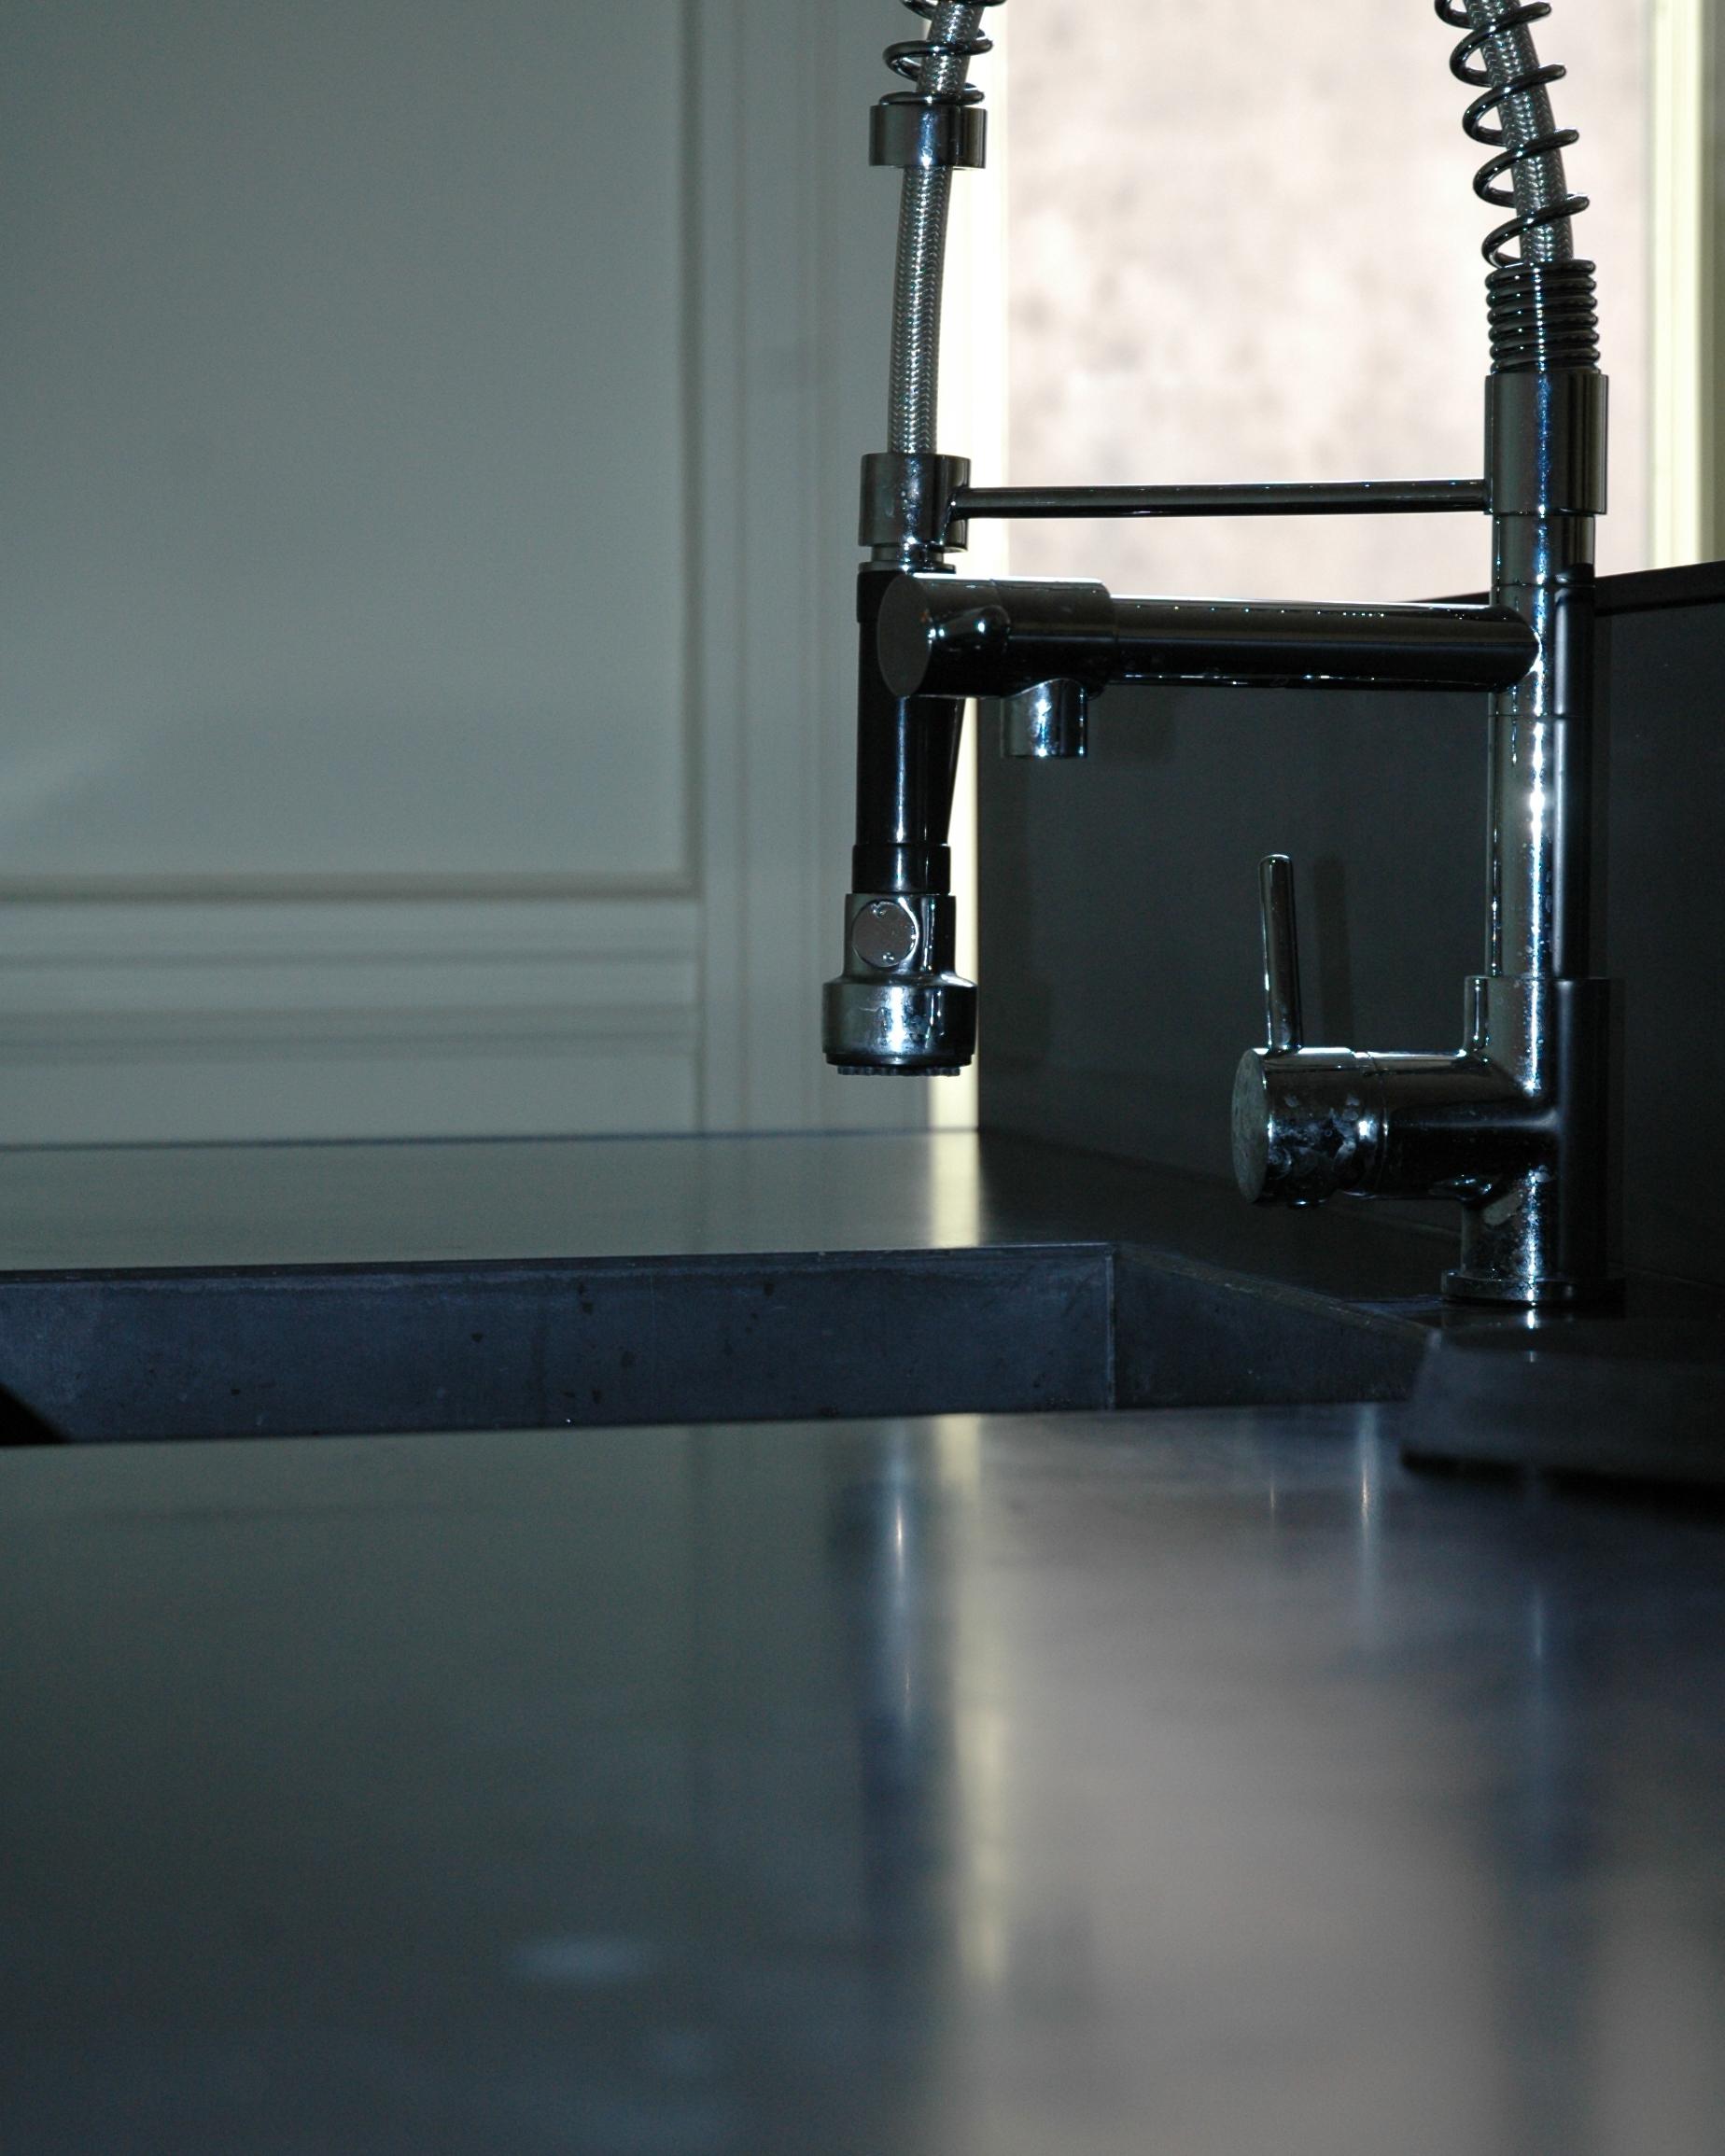 Plan de travail vasque cr dence en b ton - Plan de travail beton coule ...